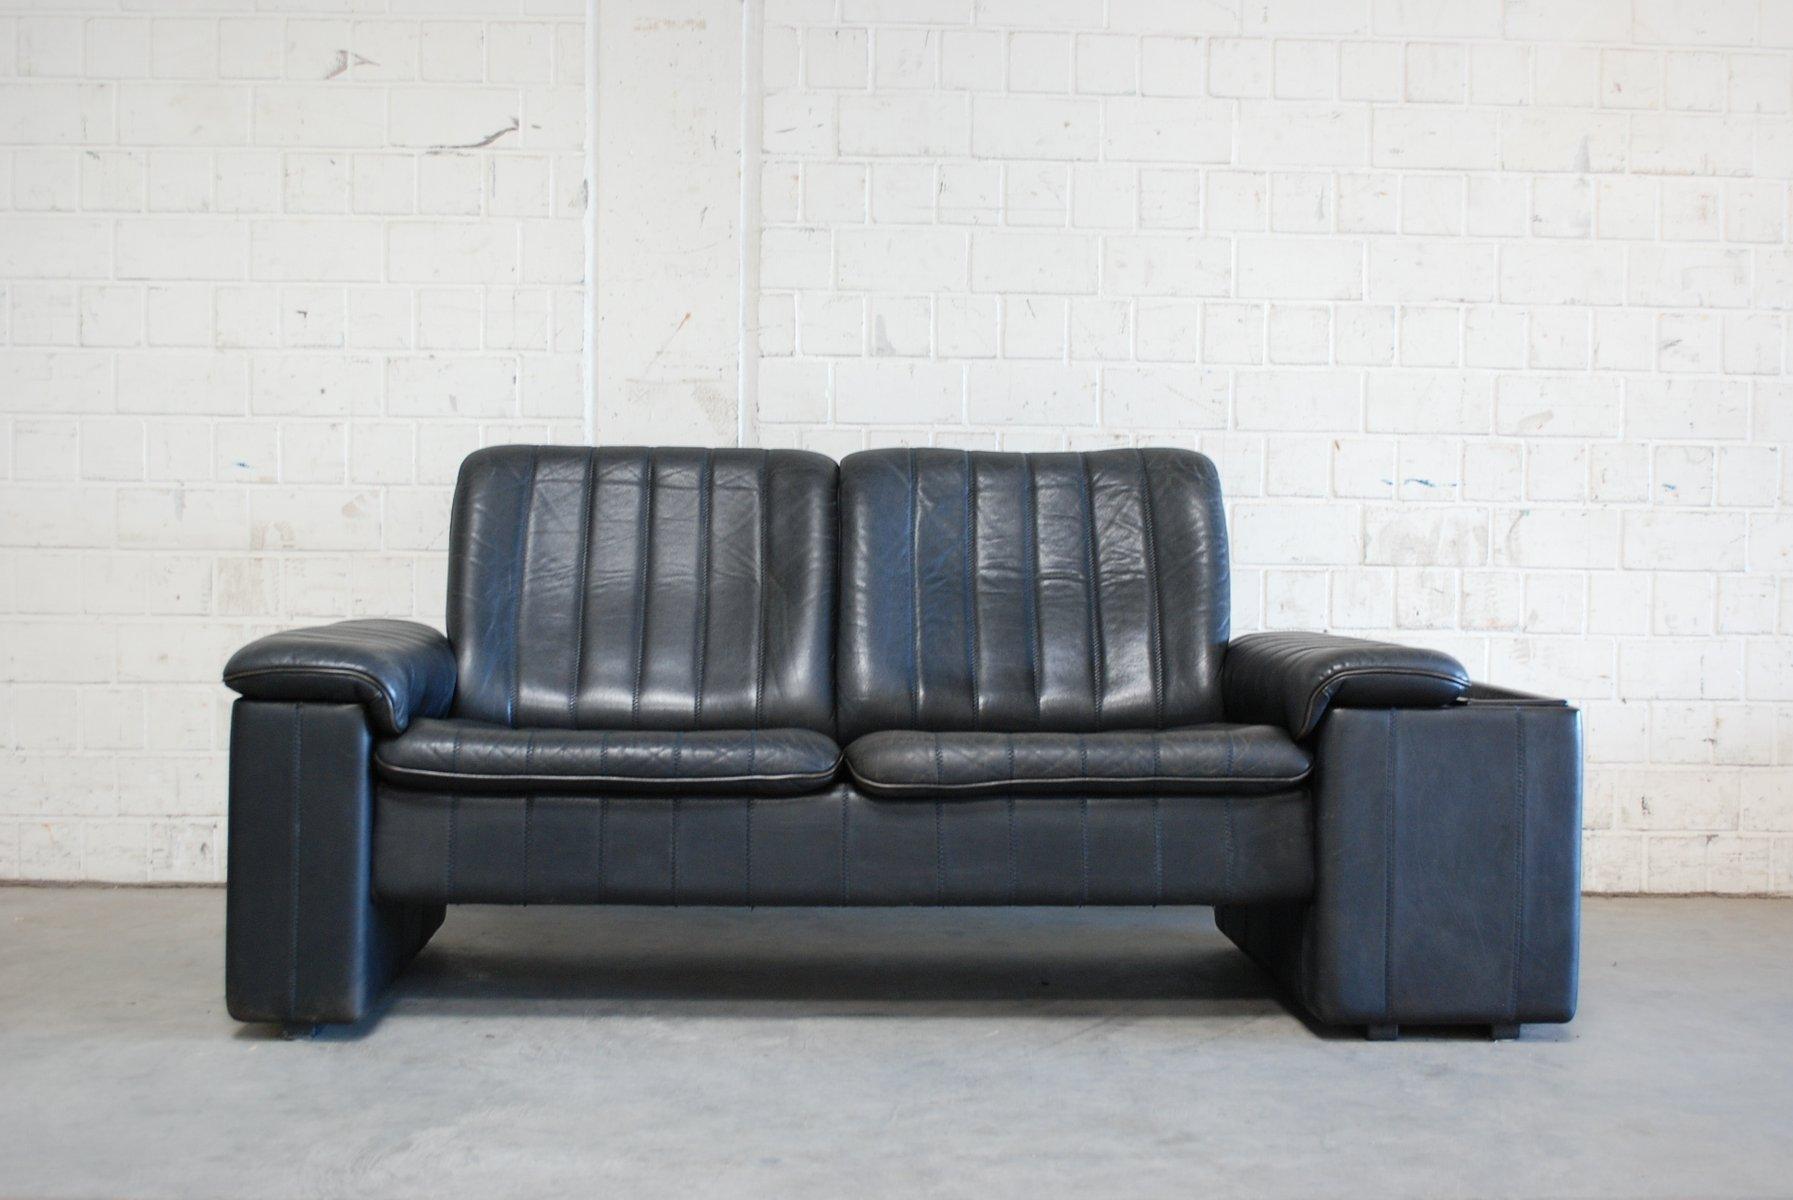 Anthrazitfarbenes Vintage Zwei-Sitzer Ledersofa von de Sede